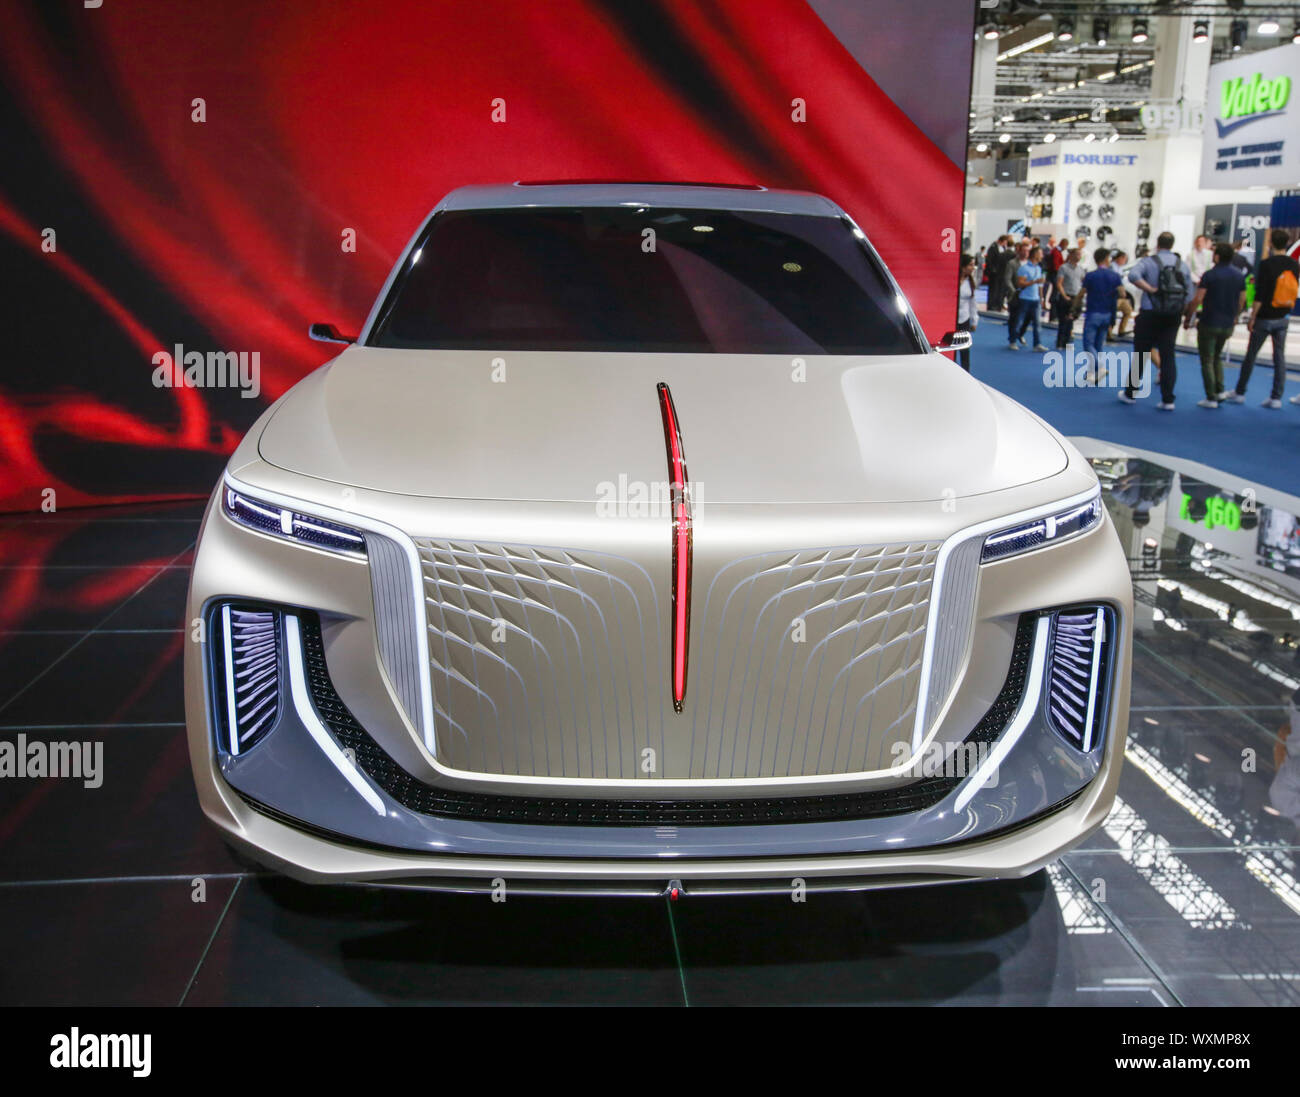 The Car Group >> Frankfurt Germany 12th Sep 2019 The Car Brand Hongqi